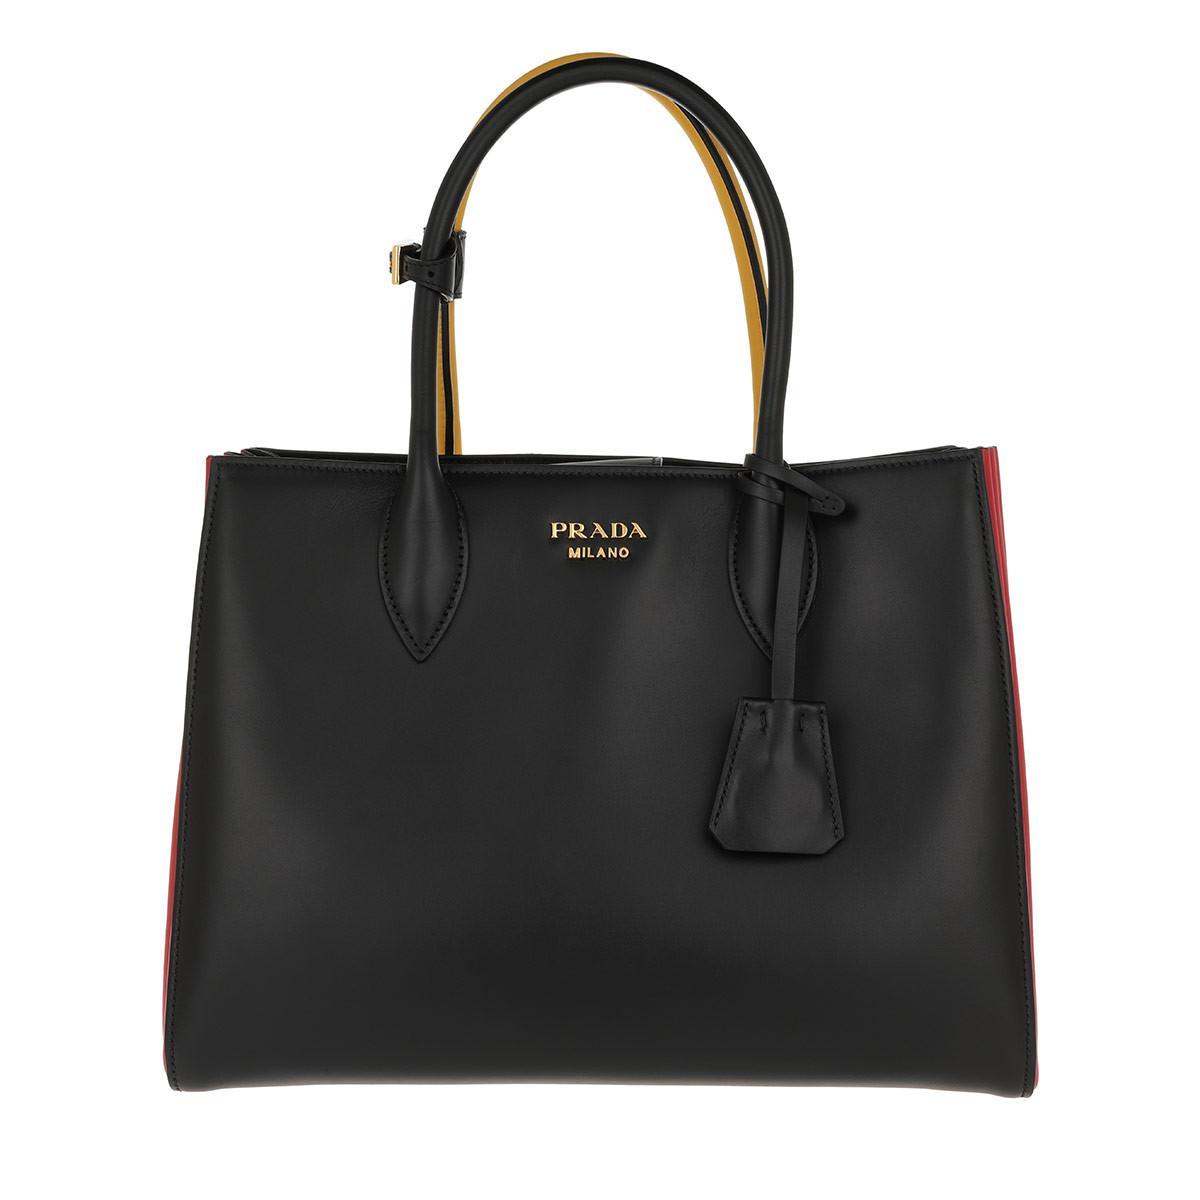 Tote - Shopping Bag City Calf Nero/Soleil - yellow, black - Tote for ladies Prada